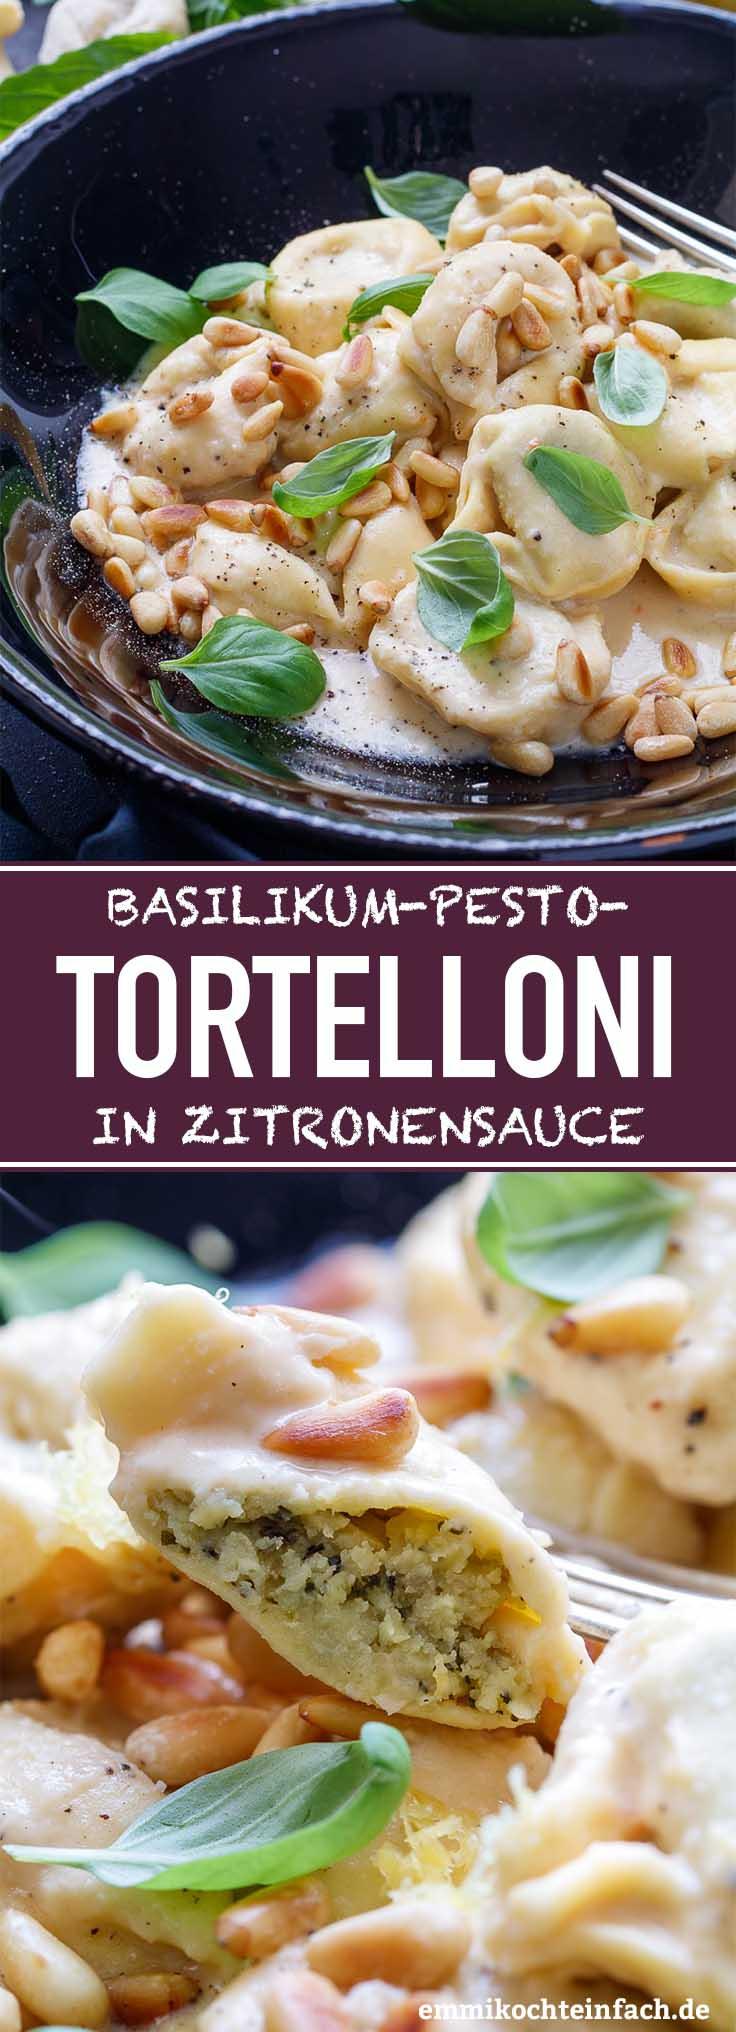 Basilikum-Pesto-Tortelloni in Zitronensauce - www.emmikochteinfach.de